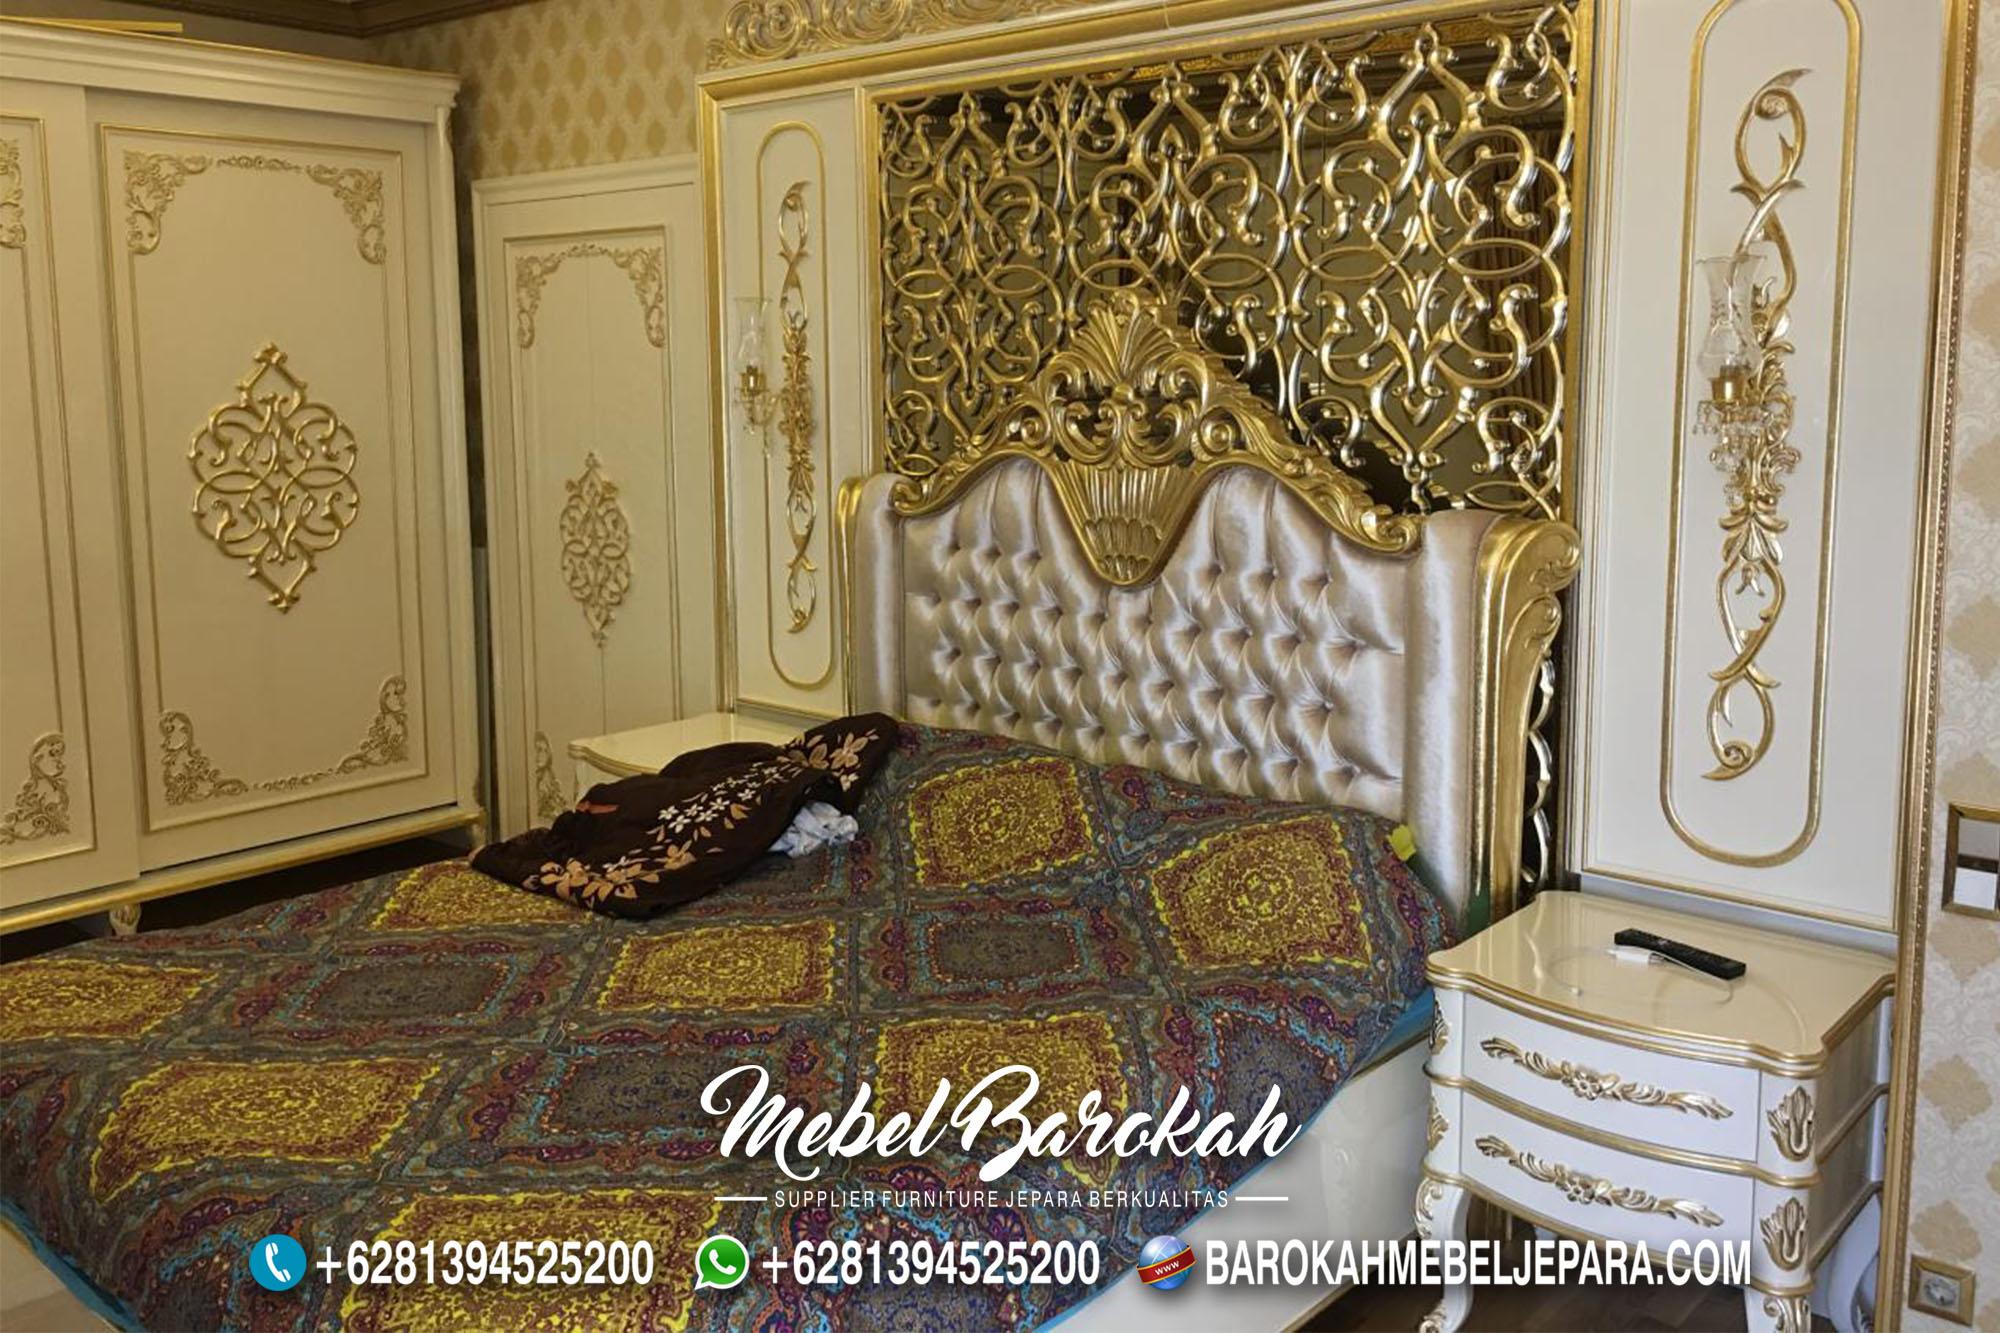 Kamar Set Klasik Putih Ukir Emas Glamor MB-628